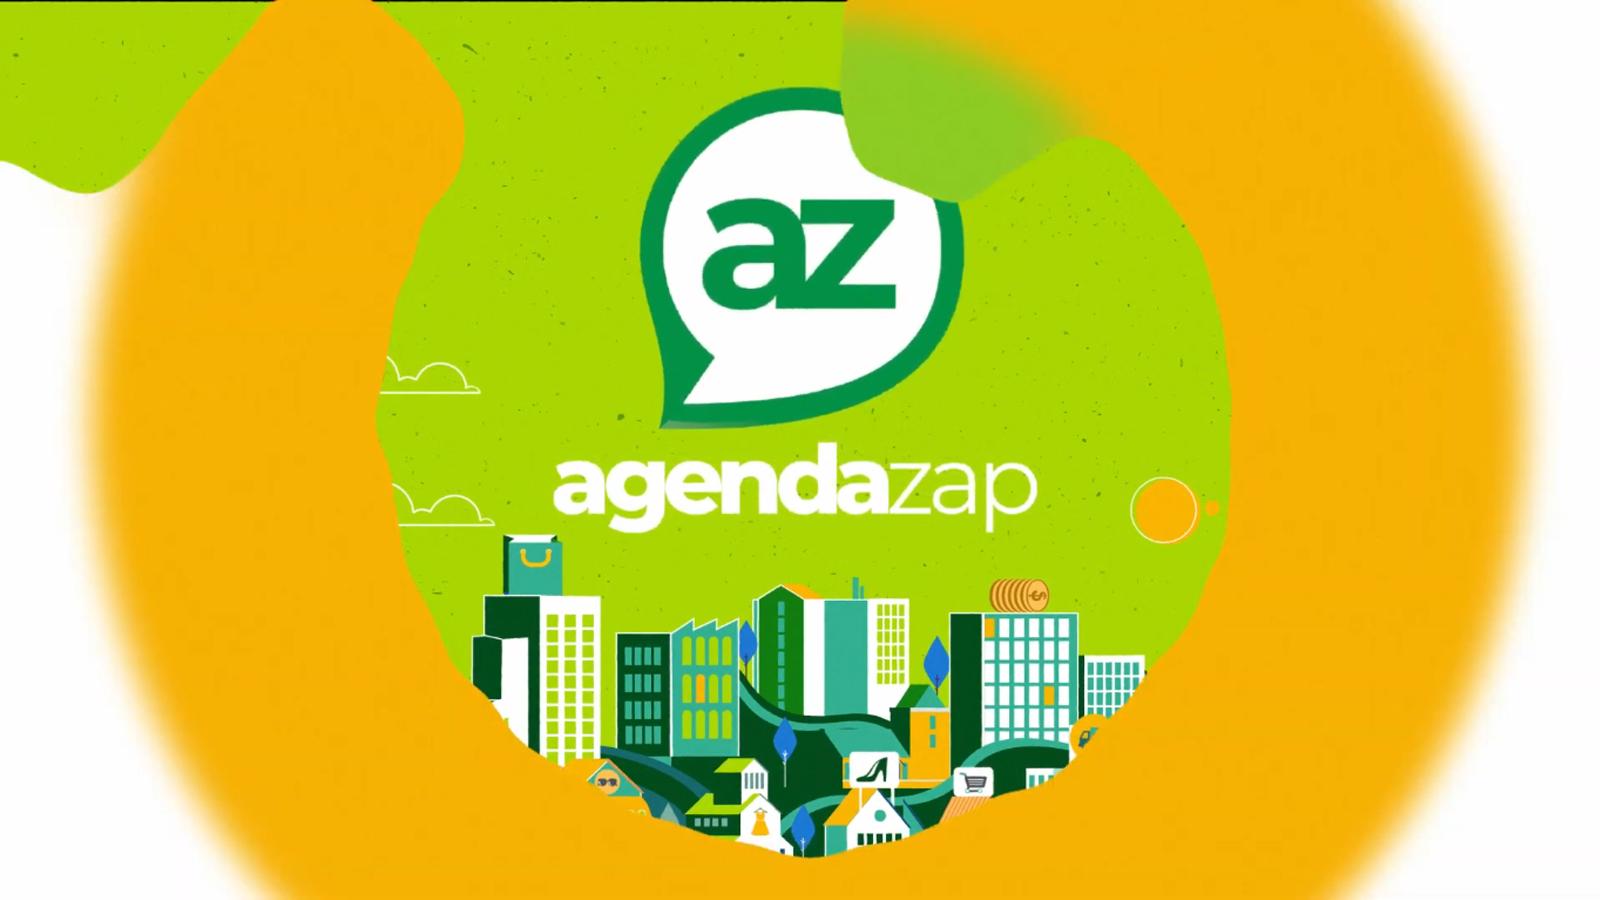 Agendazap capa